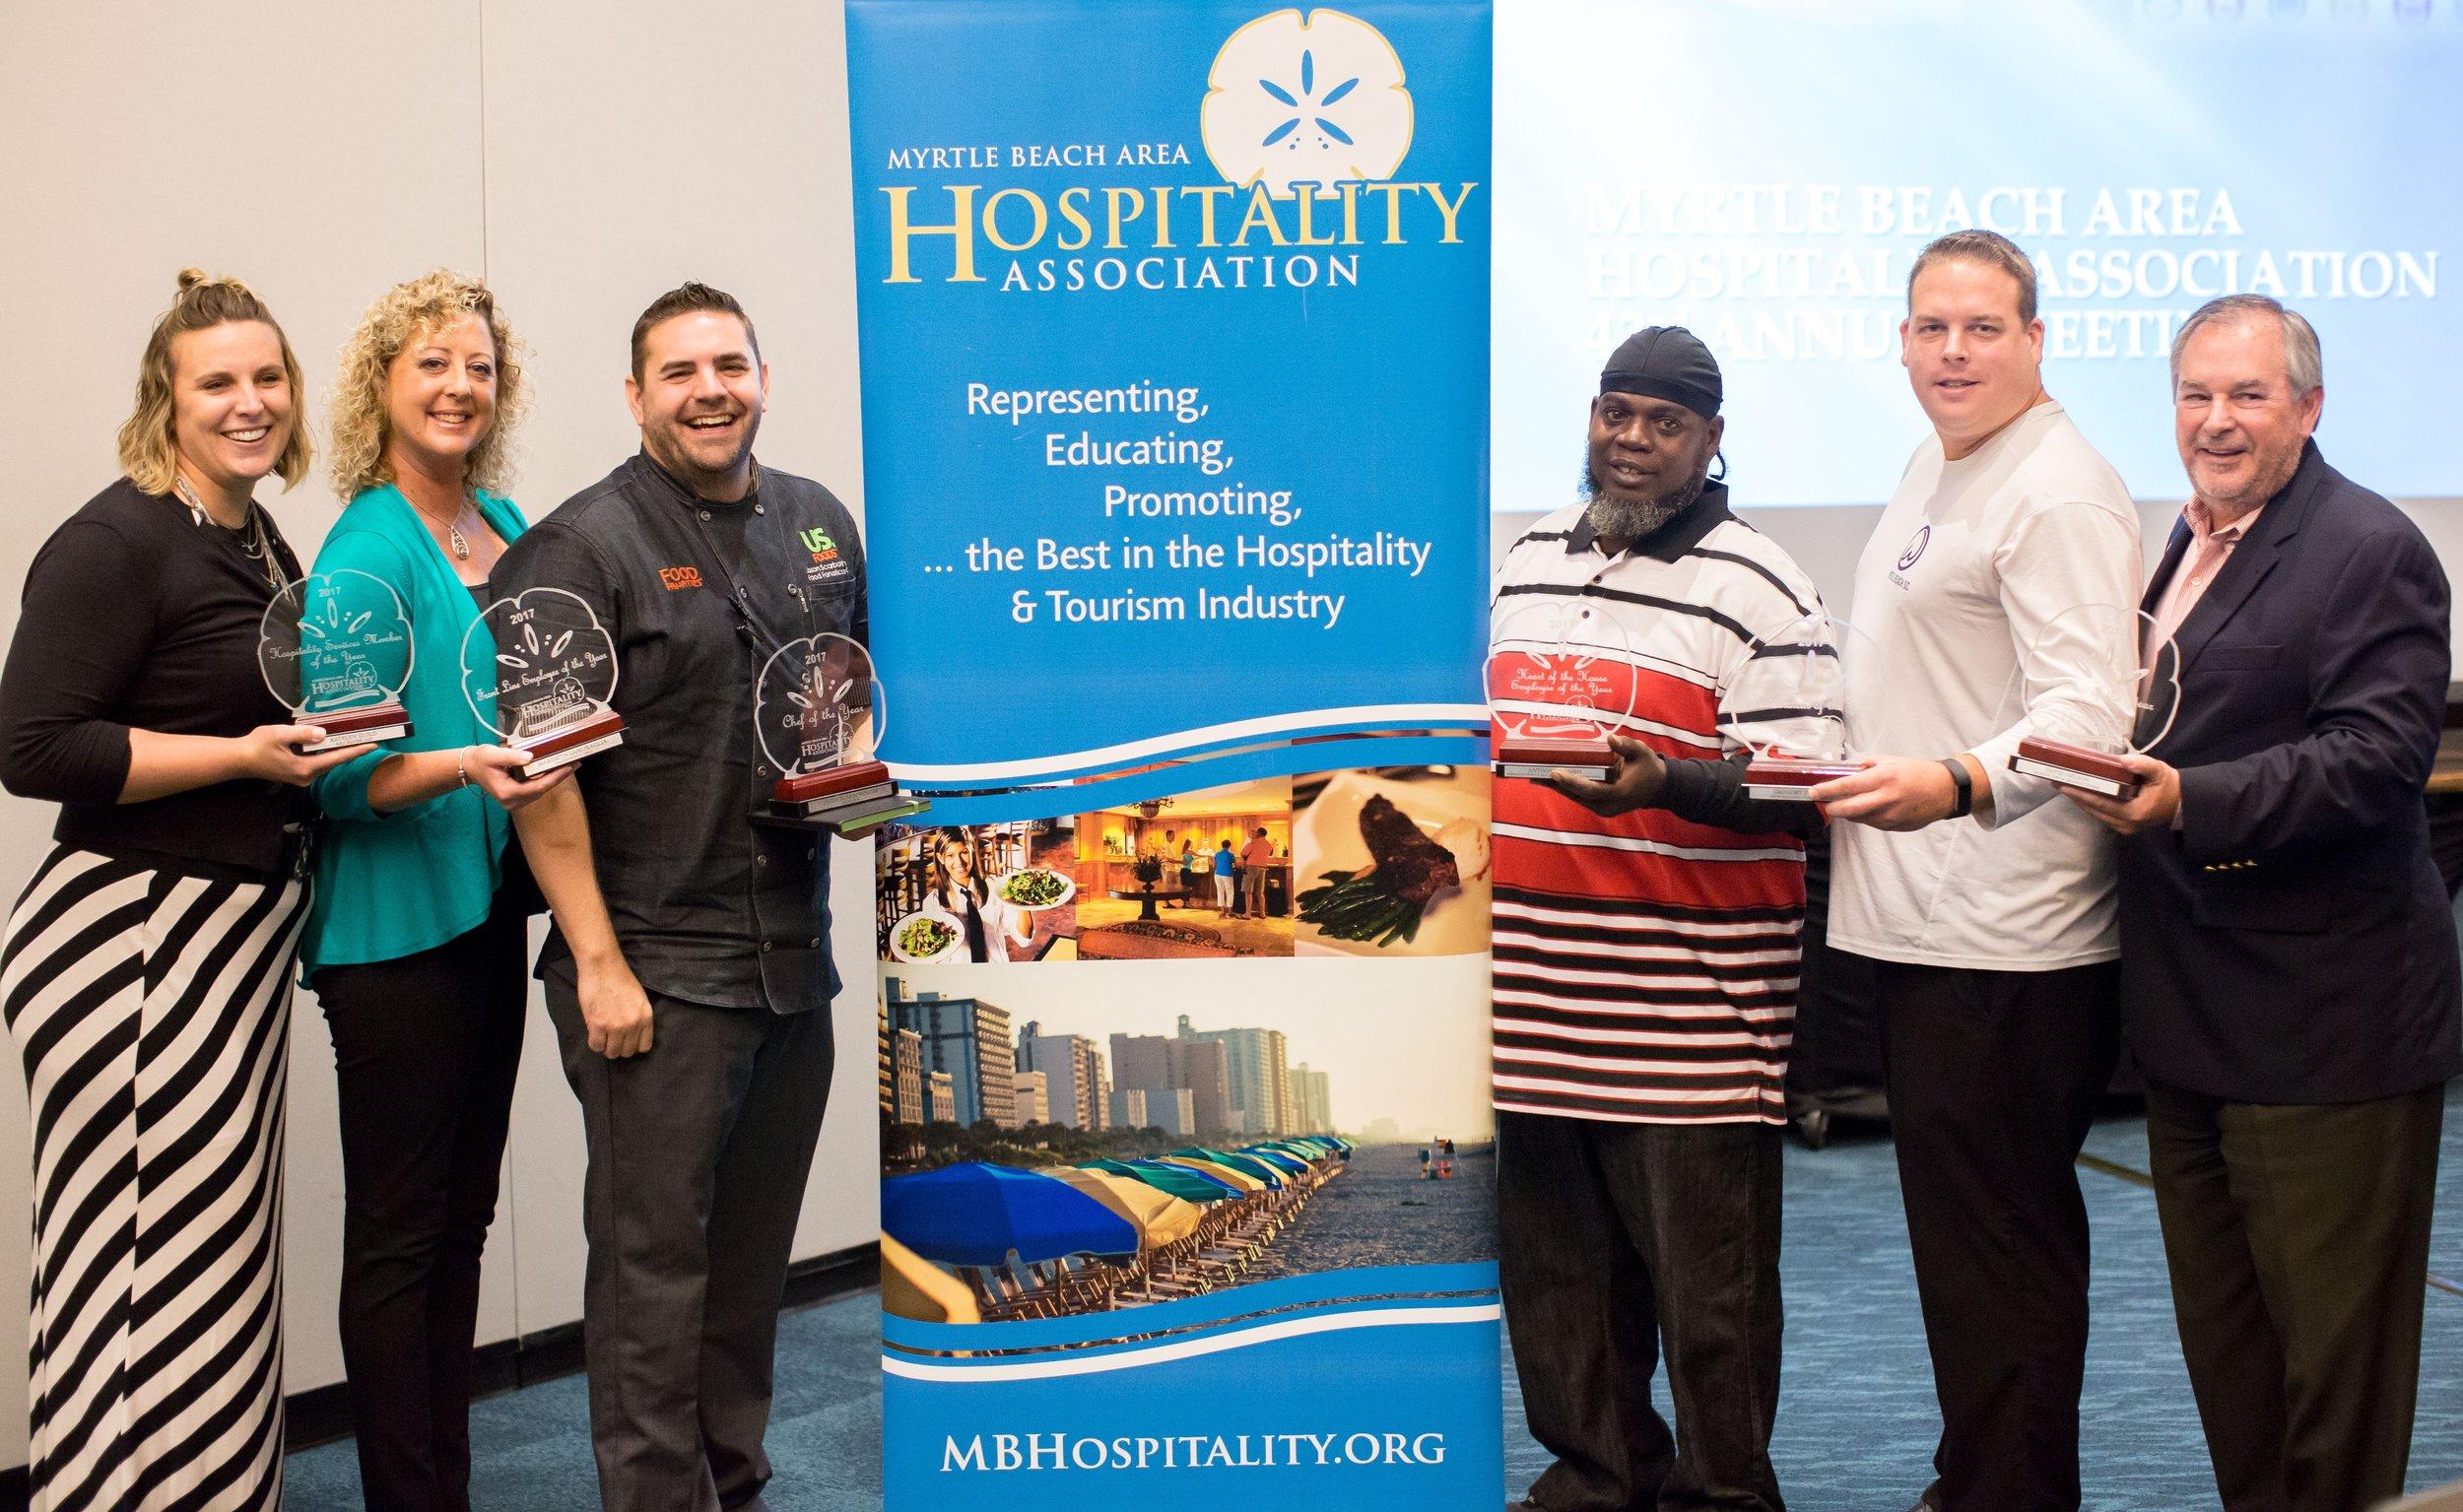 Congratulations to the 2017 Hospitality Industry Award winners: Katelyn Guild, Maribeth Lamuraglia, Jason Scarborough, Anthony Romeo, Gregory Pranzo and David Nelson.